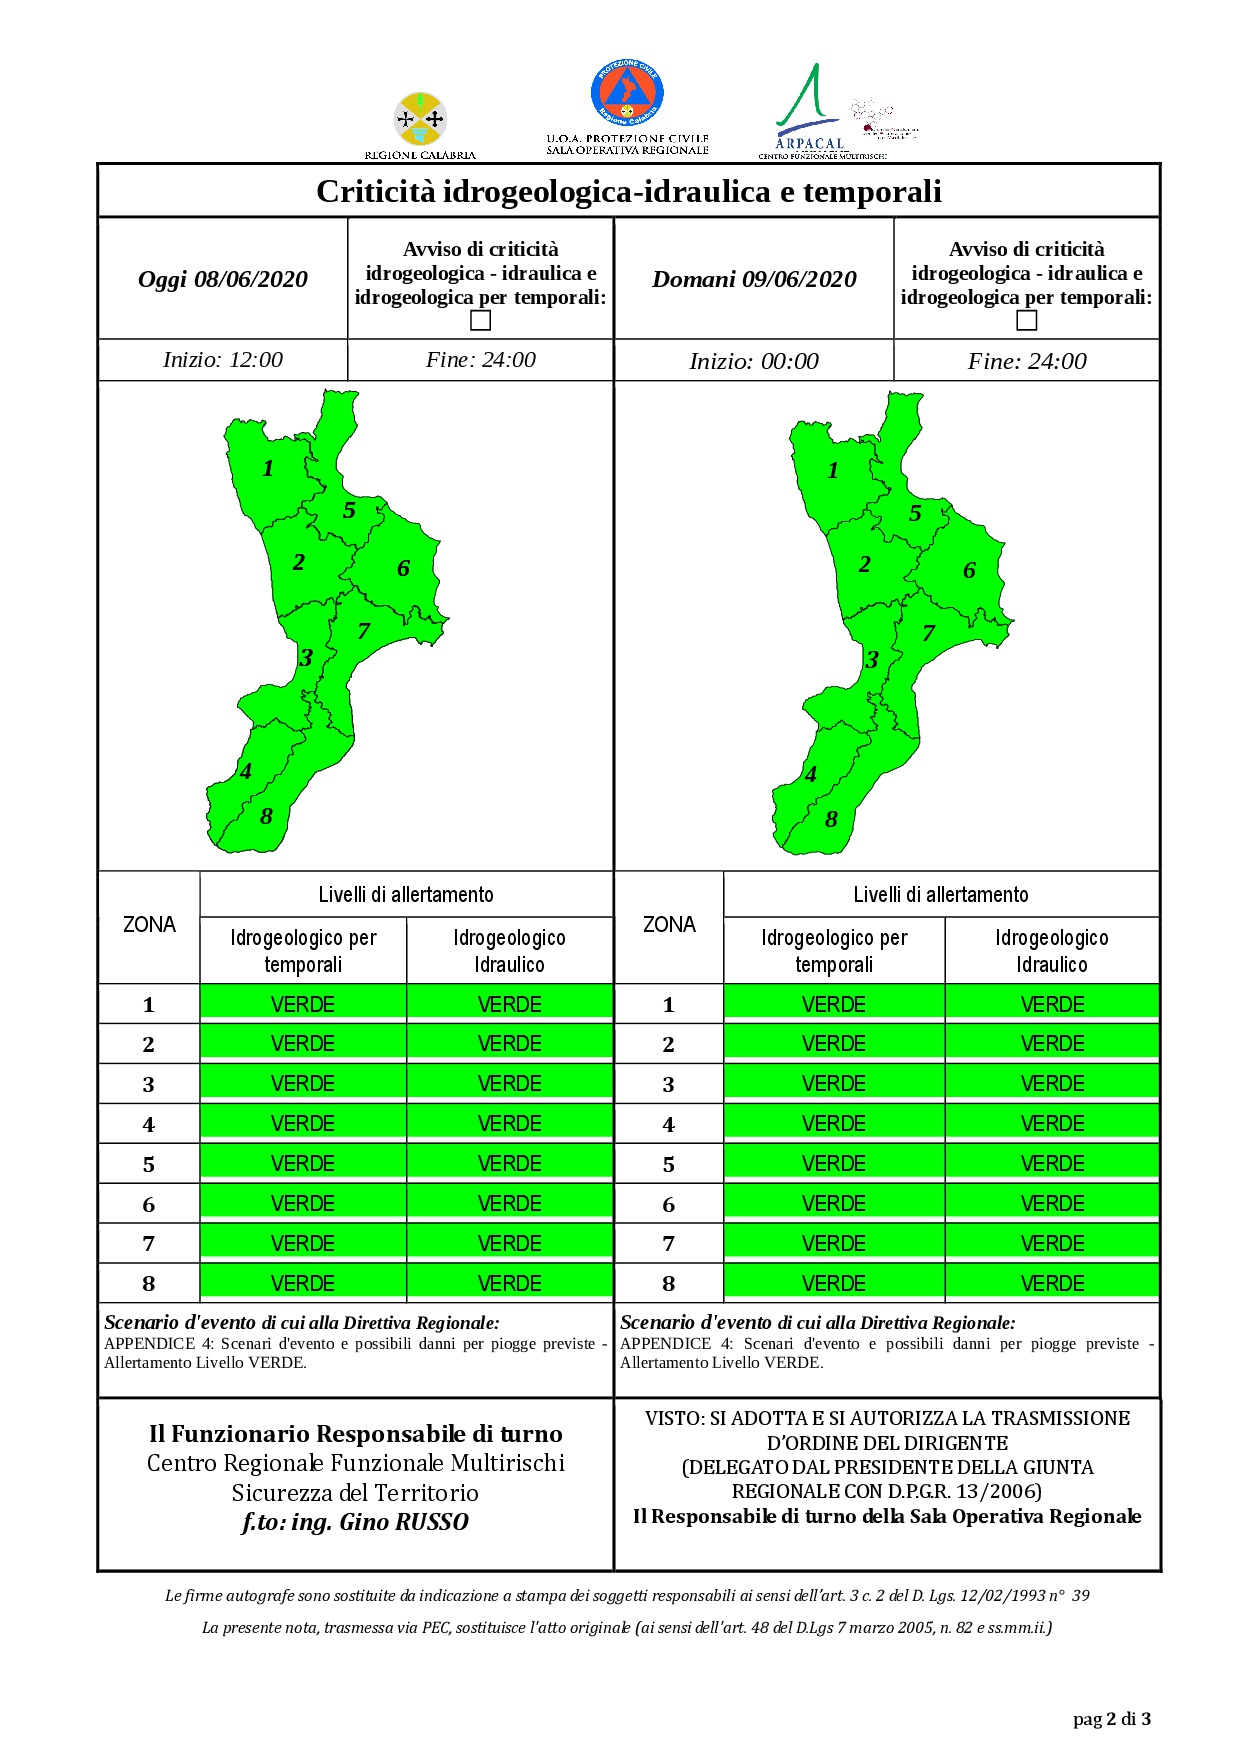 Criticità idrogeologica-idraulica e temporali in Calabria 08-06-2020